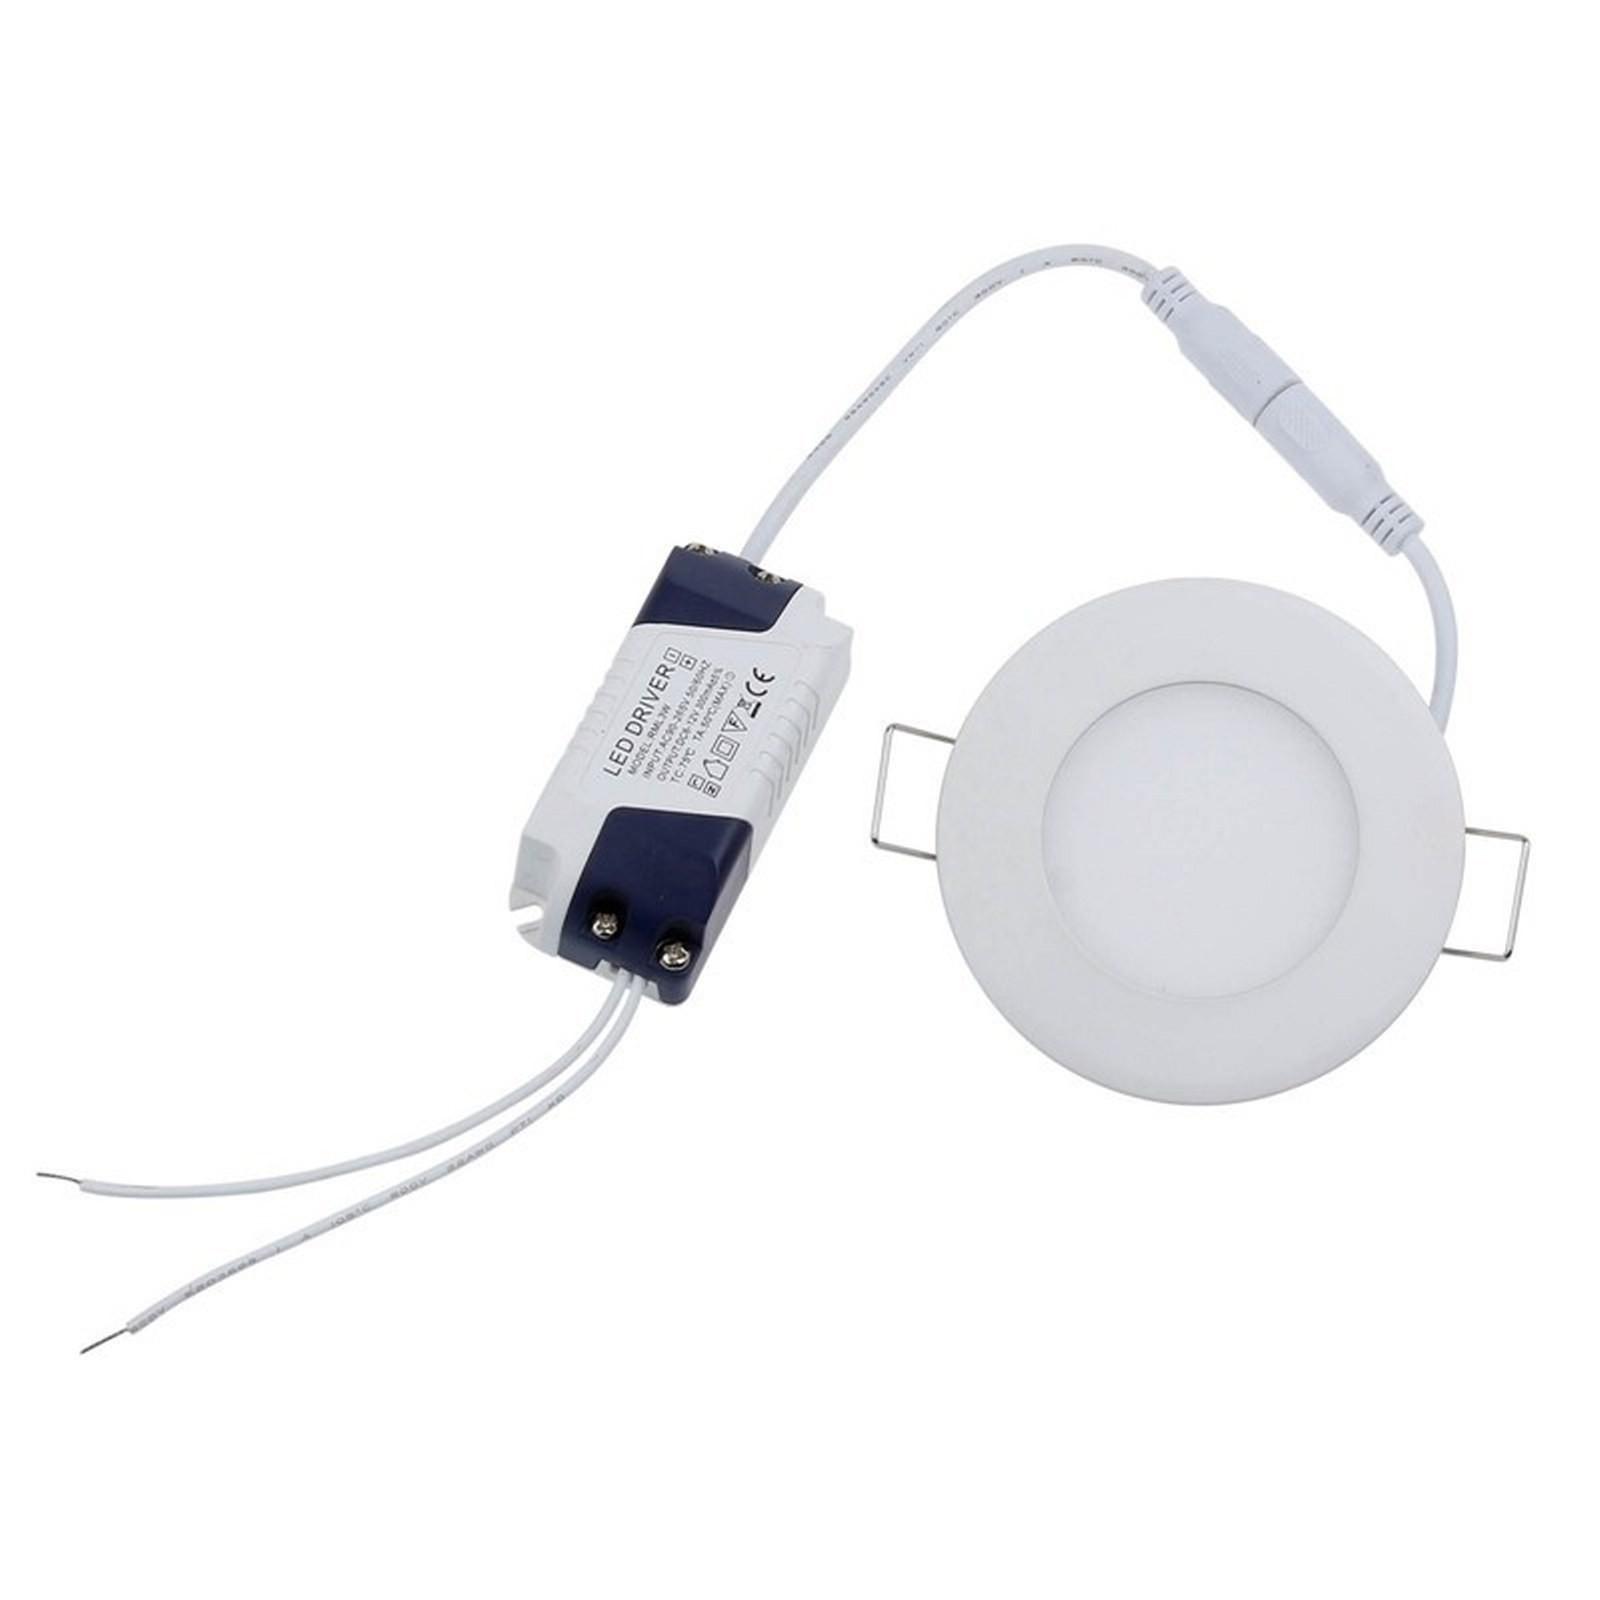 Faro faretto pannello led luce bianca fredda 3 watt for Luce bianca led